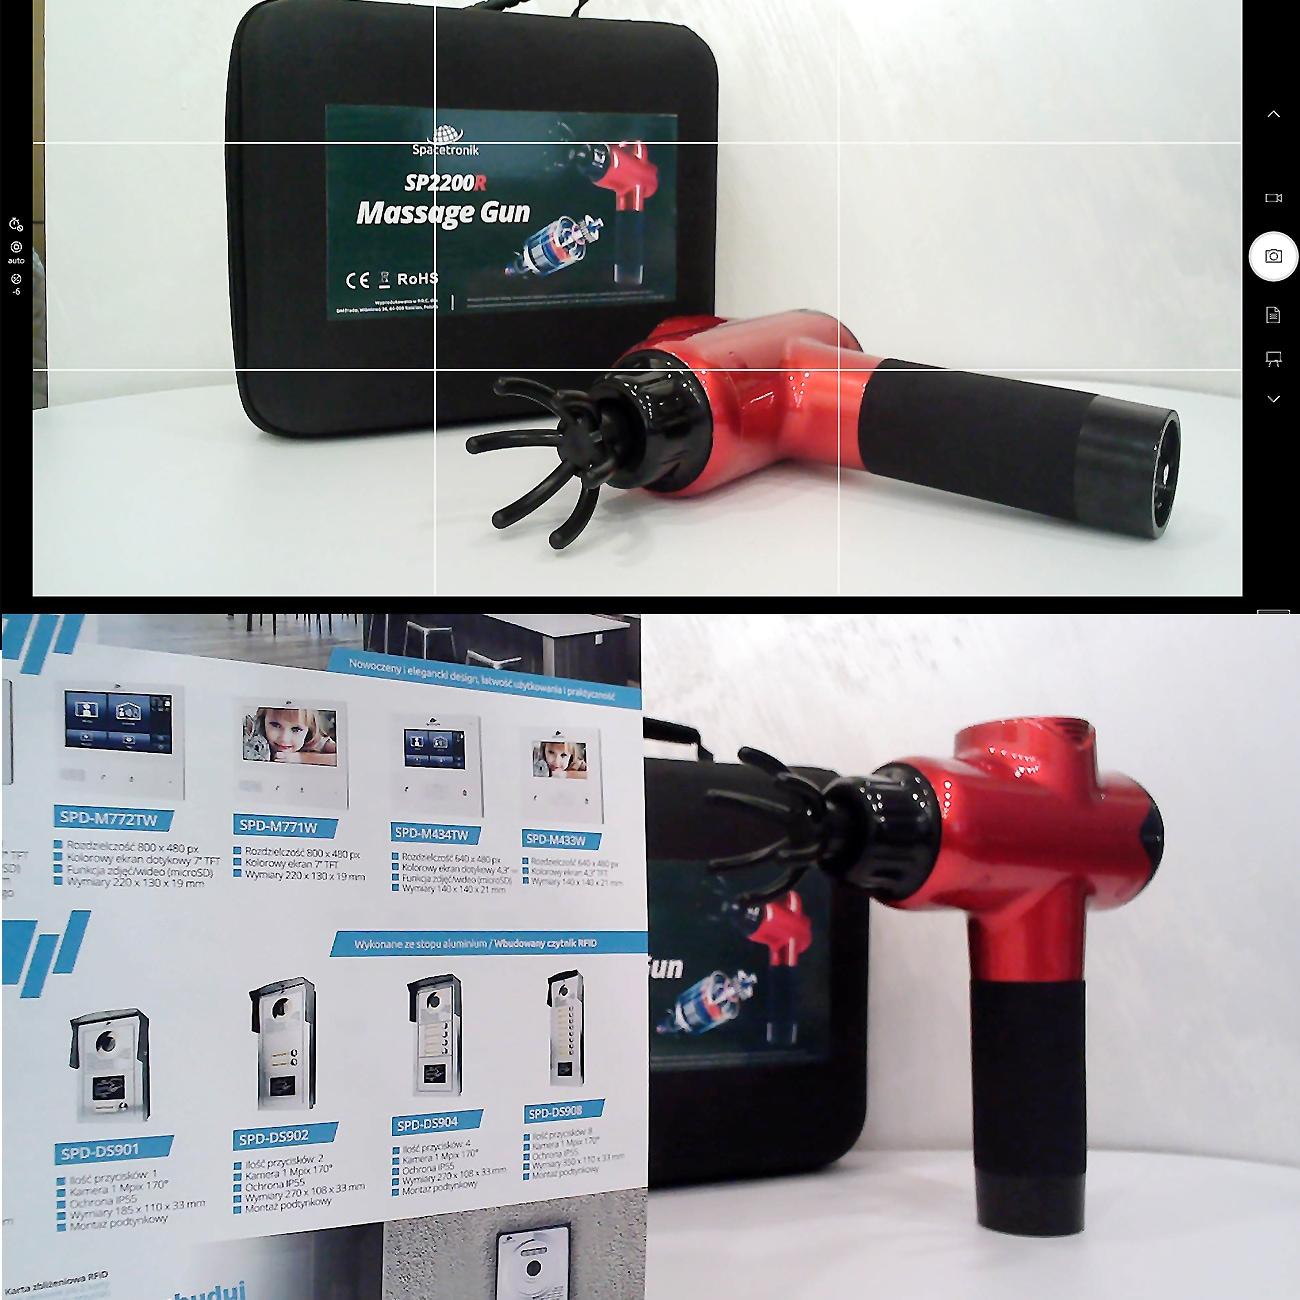 Gaming WebCam For Streaming USB FHD Microphone Camera Auto Focus SP-WCAM11 - 12